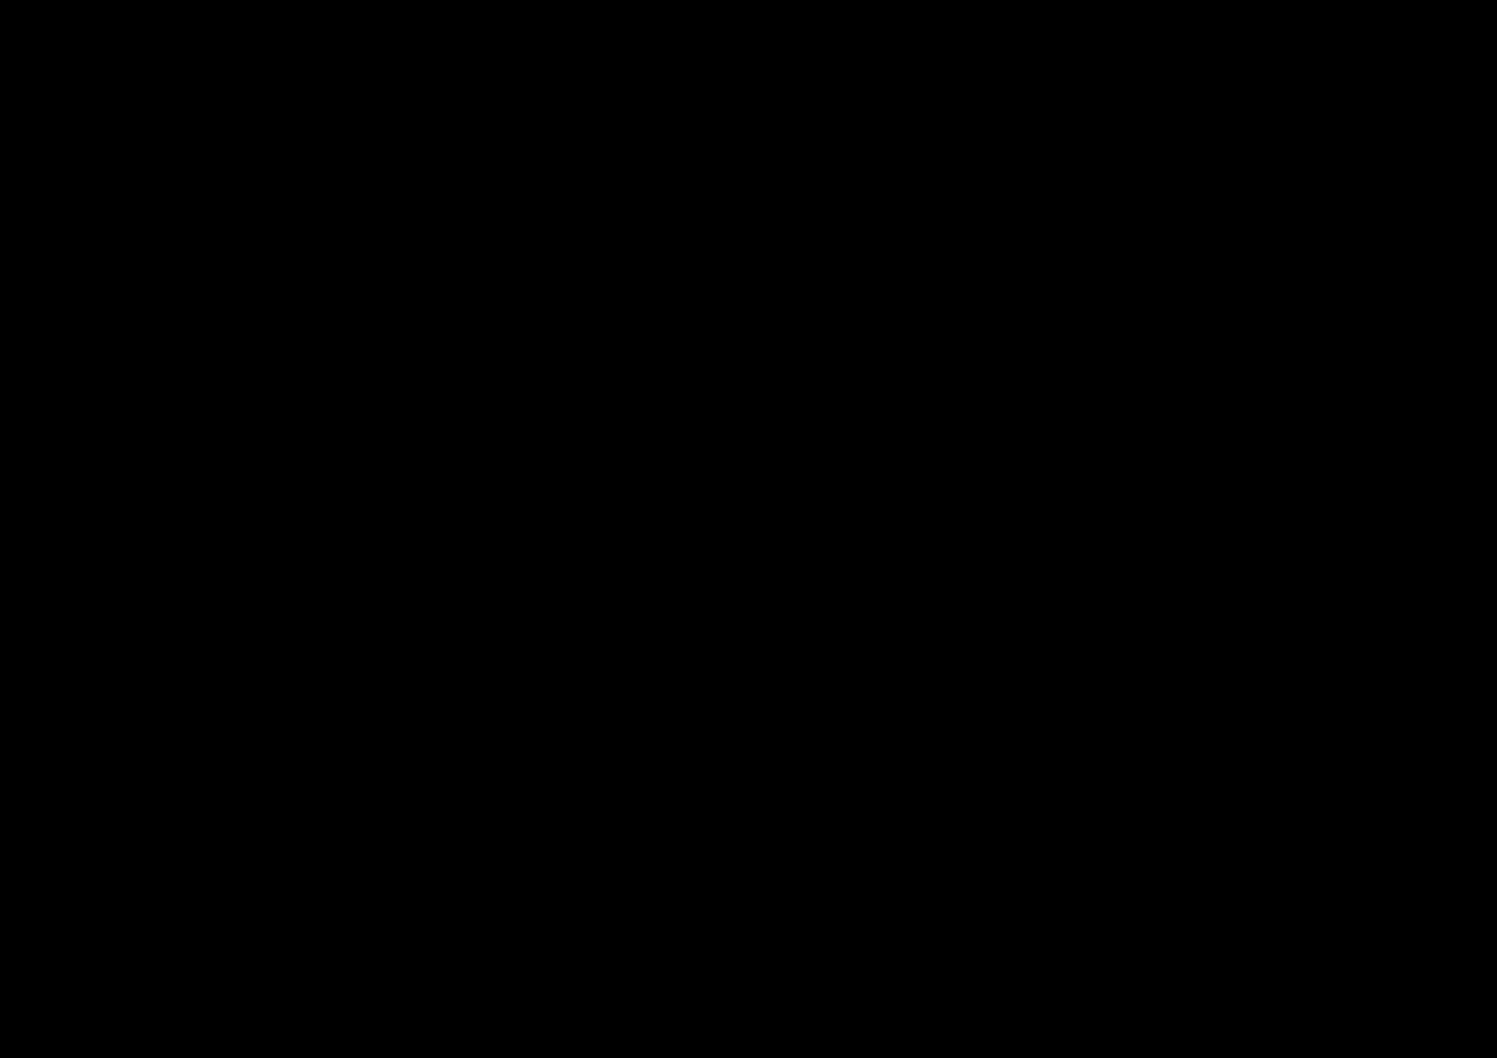 fiche-info-aviron-certificat-mdical